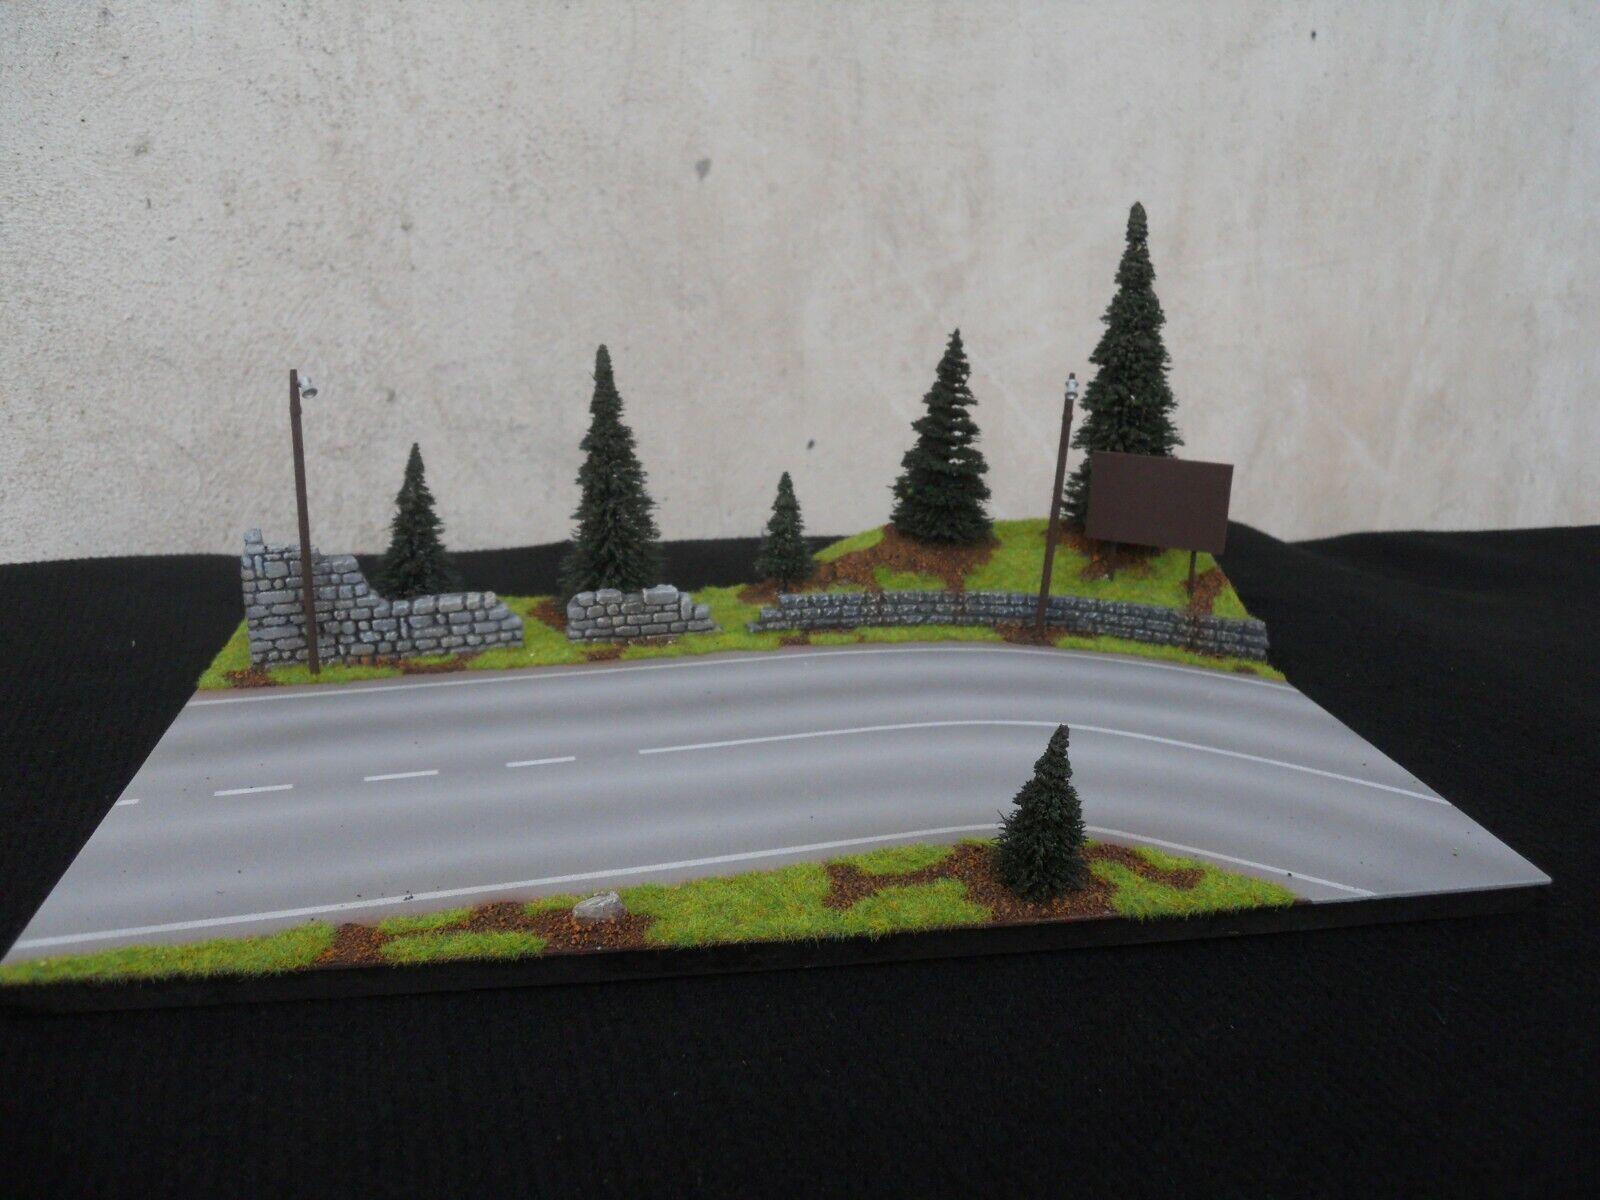 Diorama Vehicles 1 1 1 43 L 36 x L 24 cm Road of Mounting N°3 19b